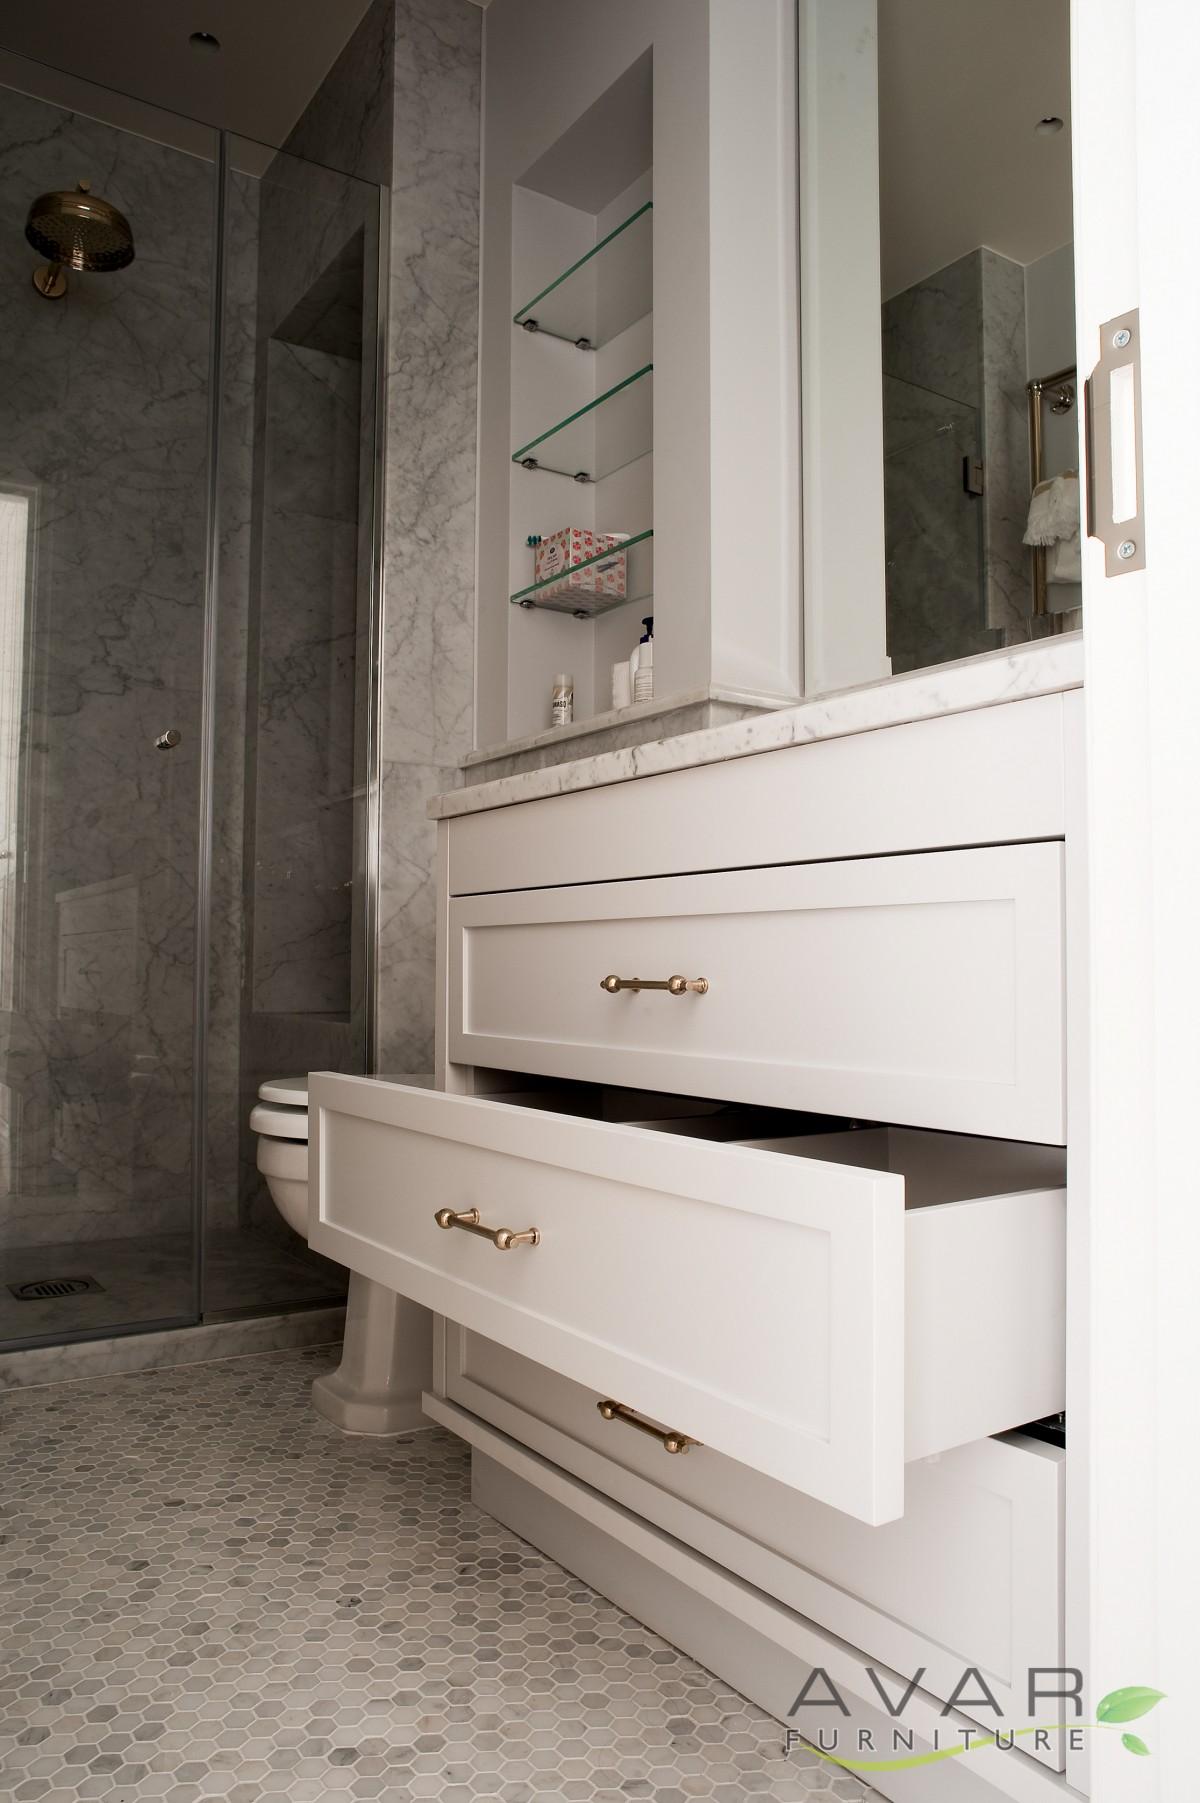 ƸӜƷ Unique Furniture Ideas Gallery 6 North London Uk